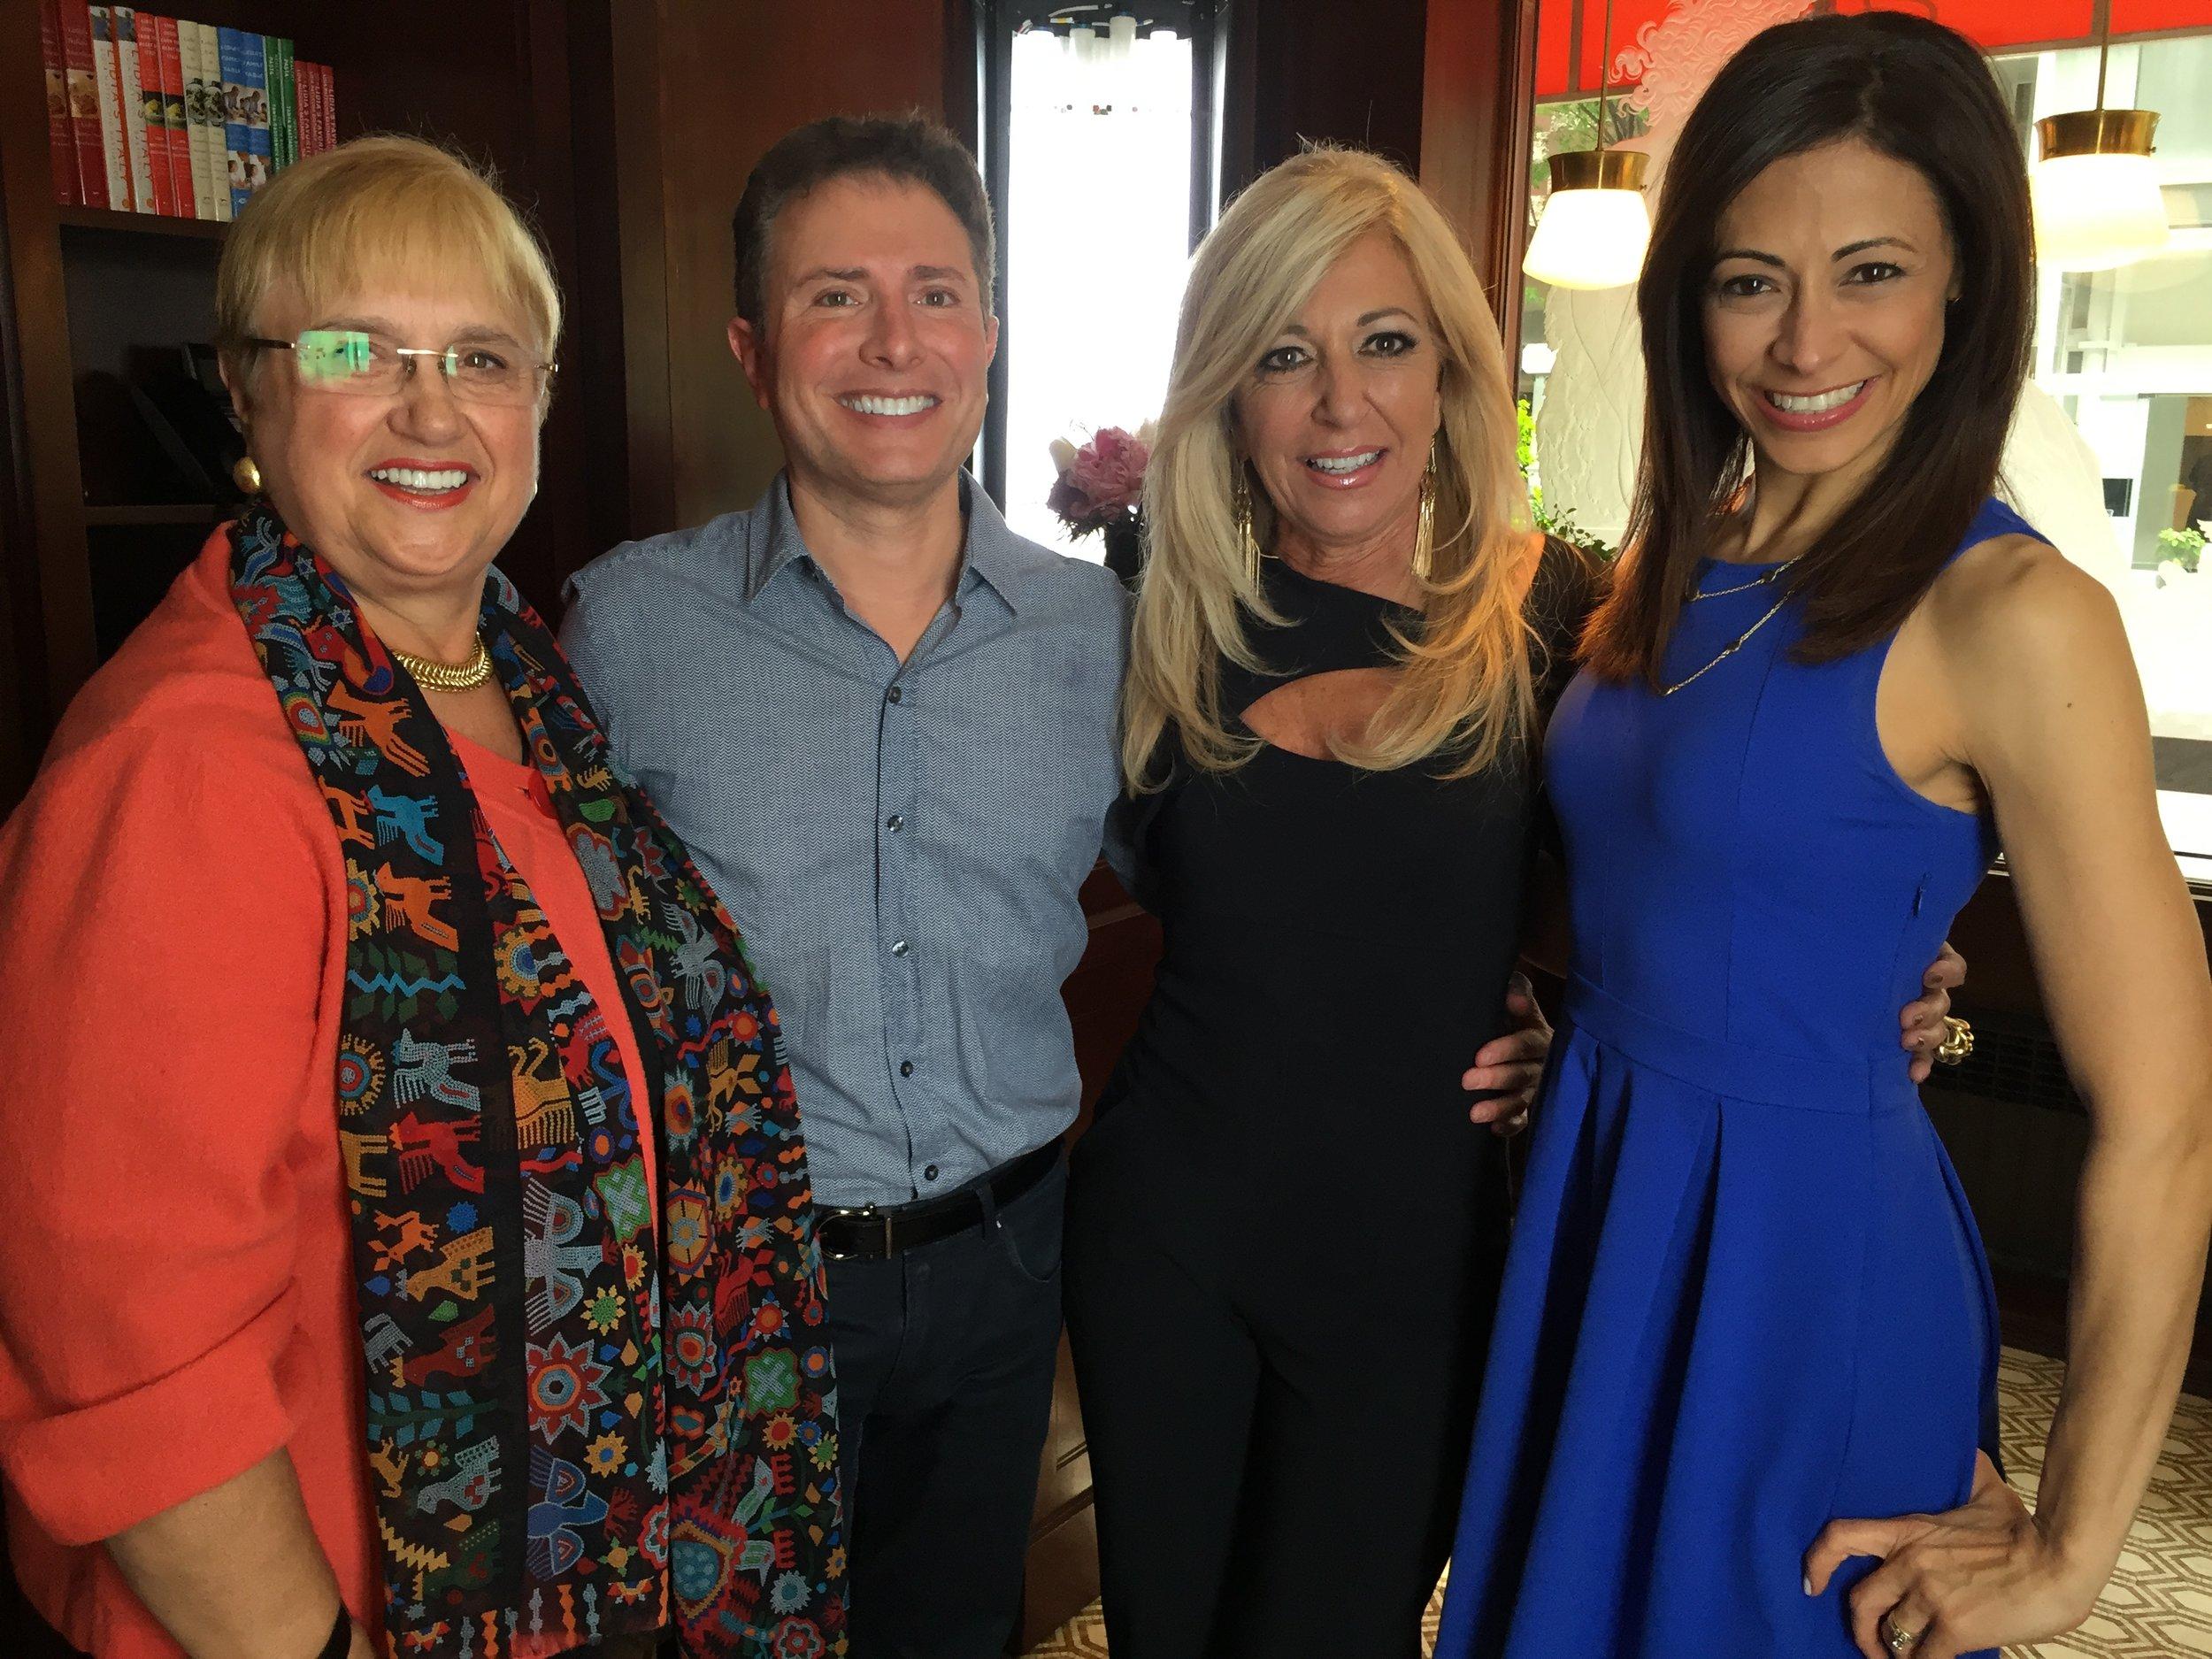 With Judge DiMango, Lidia Bastianich and Lisa Mateo